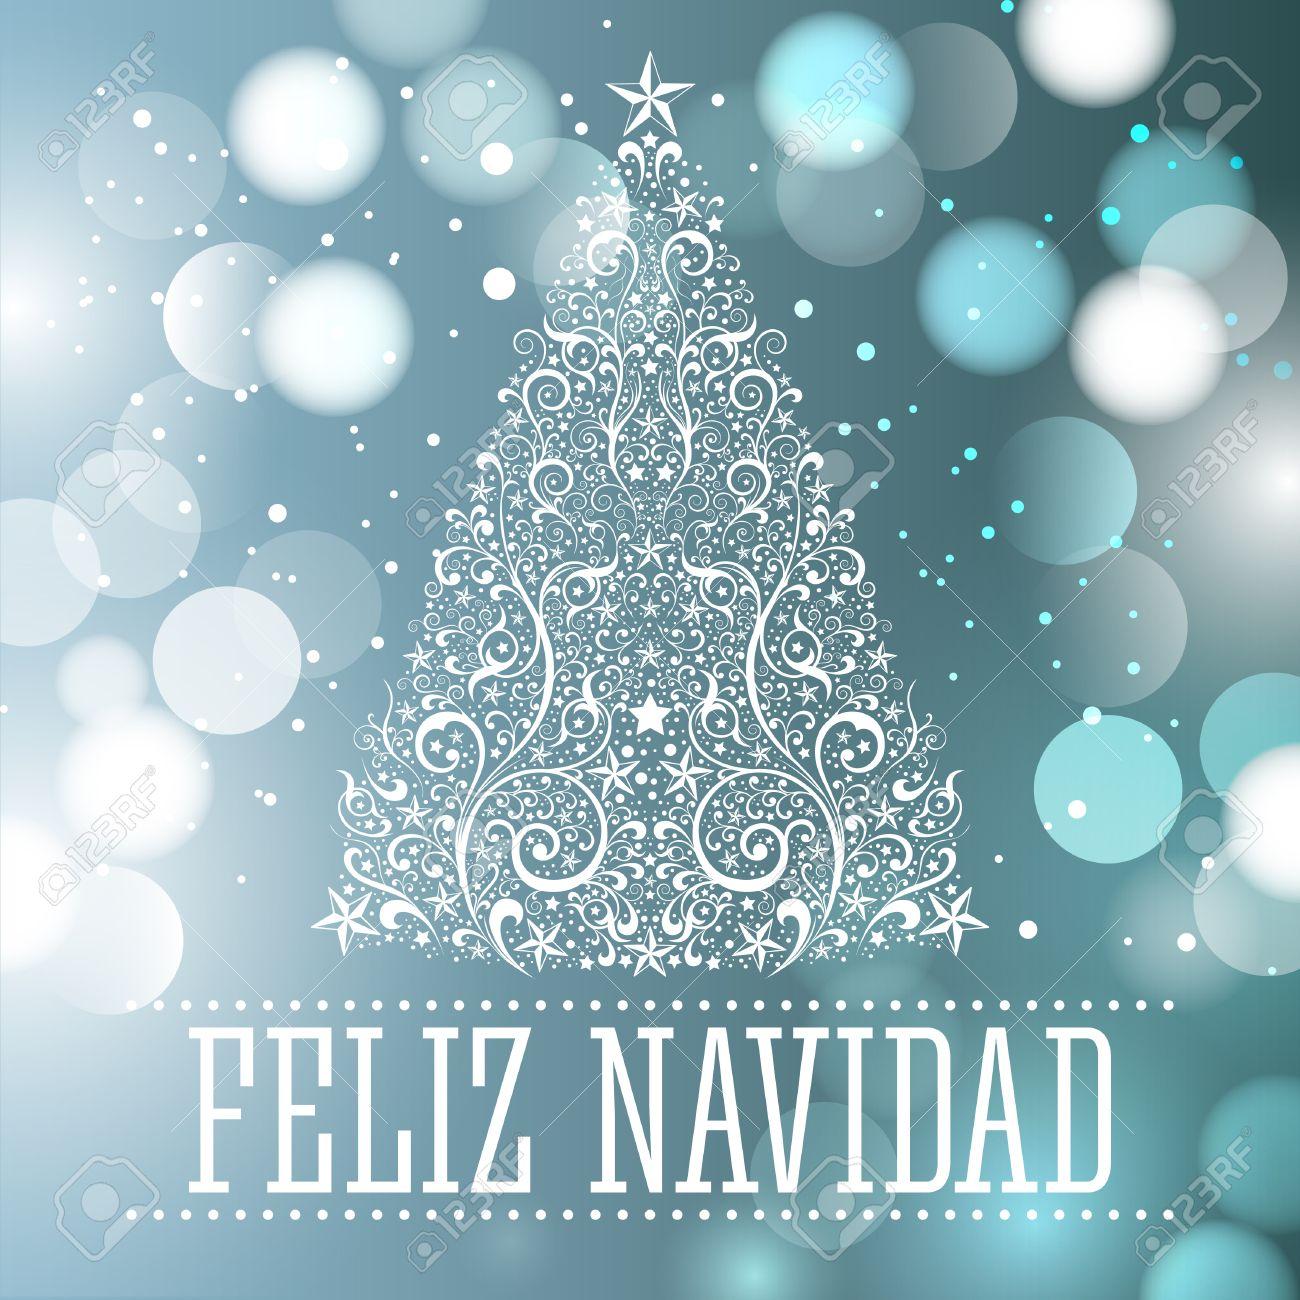 Feliz Navidad - Merry Christmas Spanish Text Card - Vector Fantasy ...